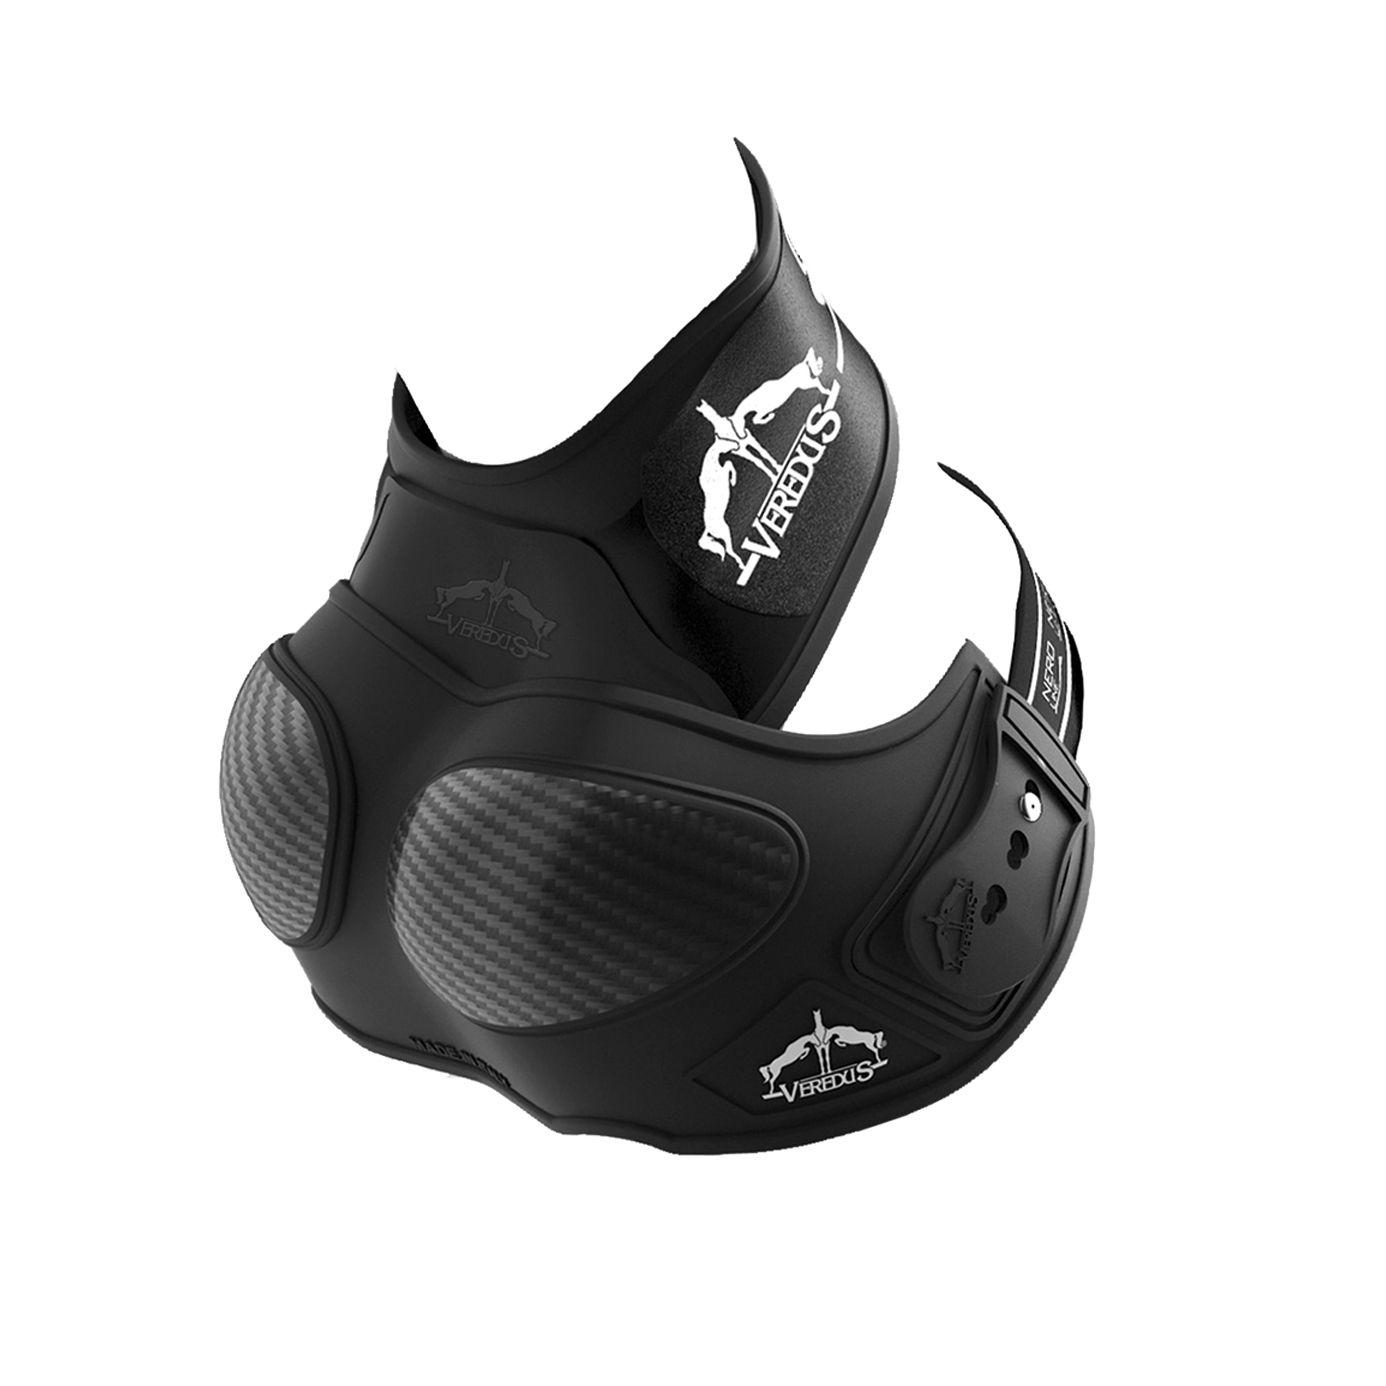 Veredus Carbon Shield Over Reach Boots Image